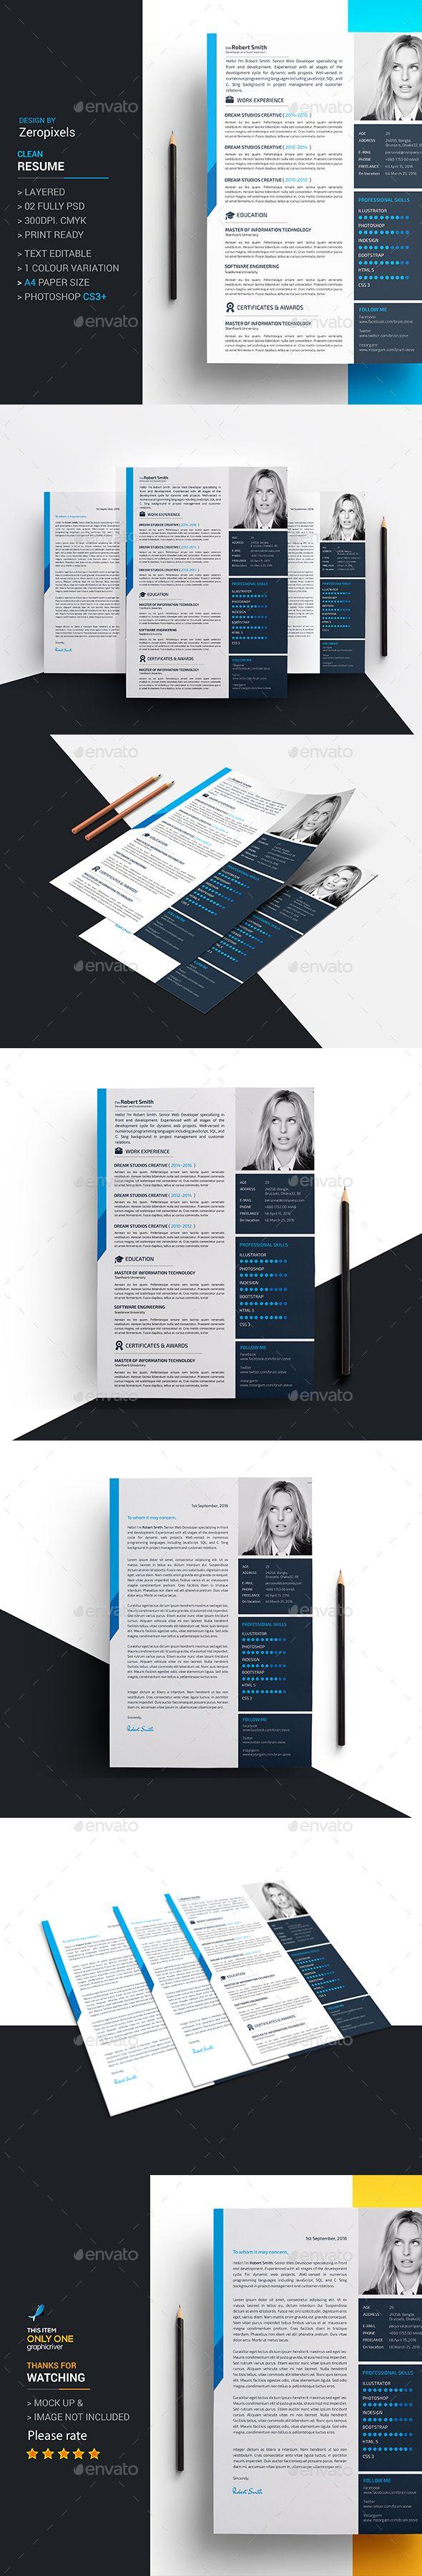 357 best cv images on pinterest resume cv resume templates and